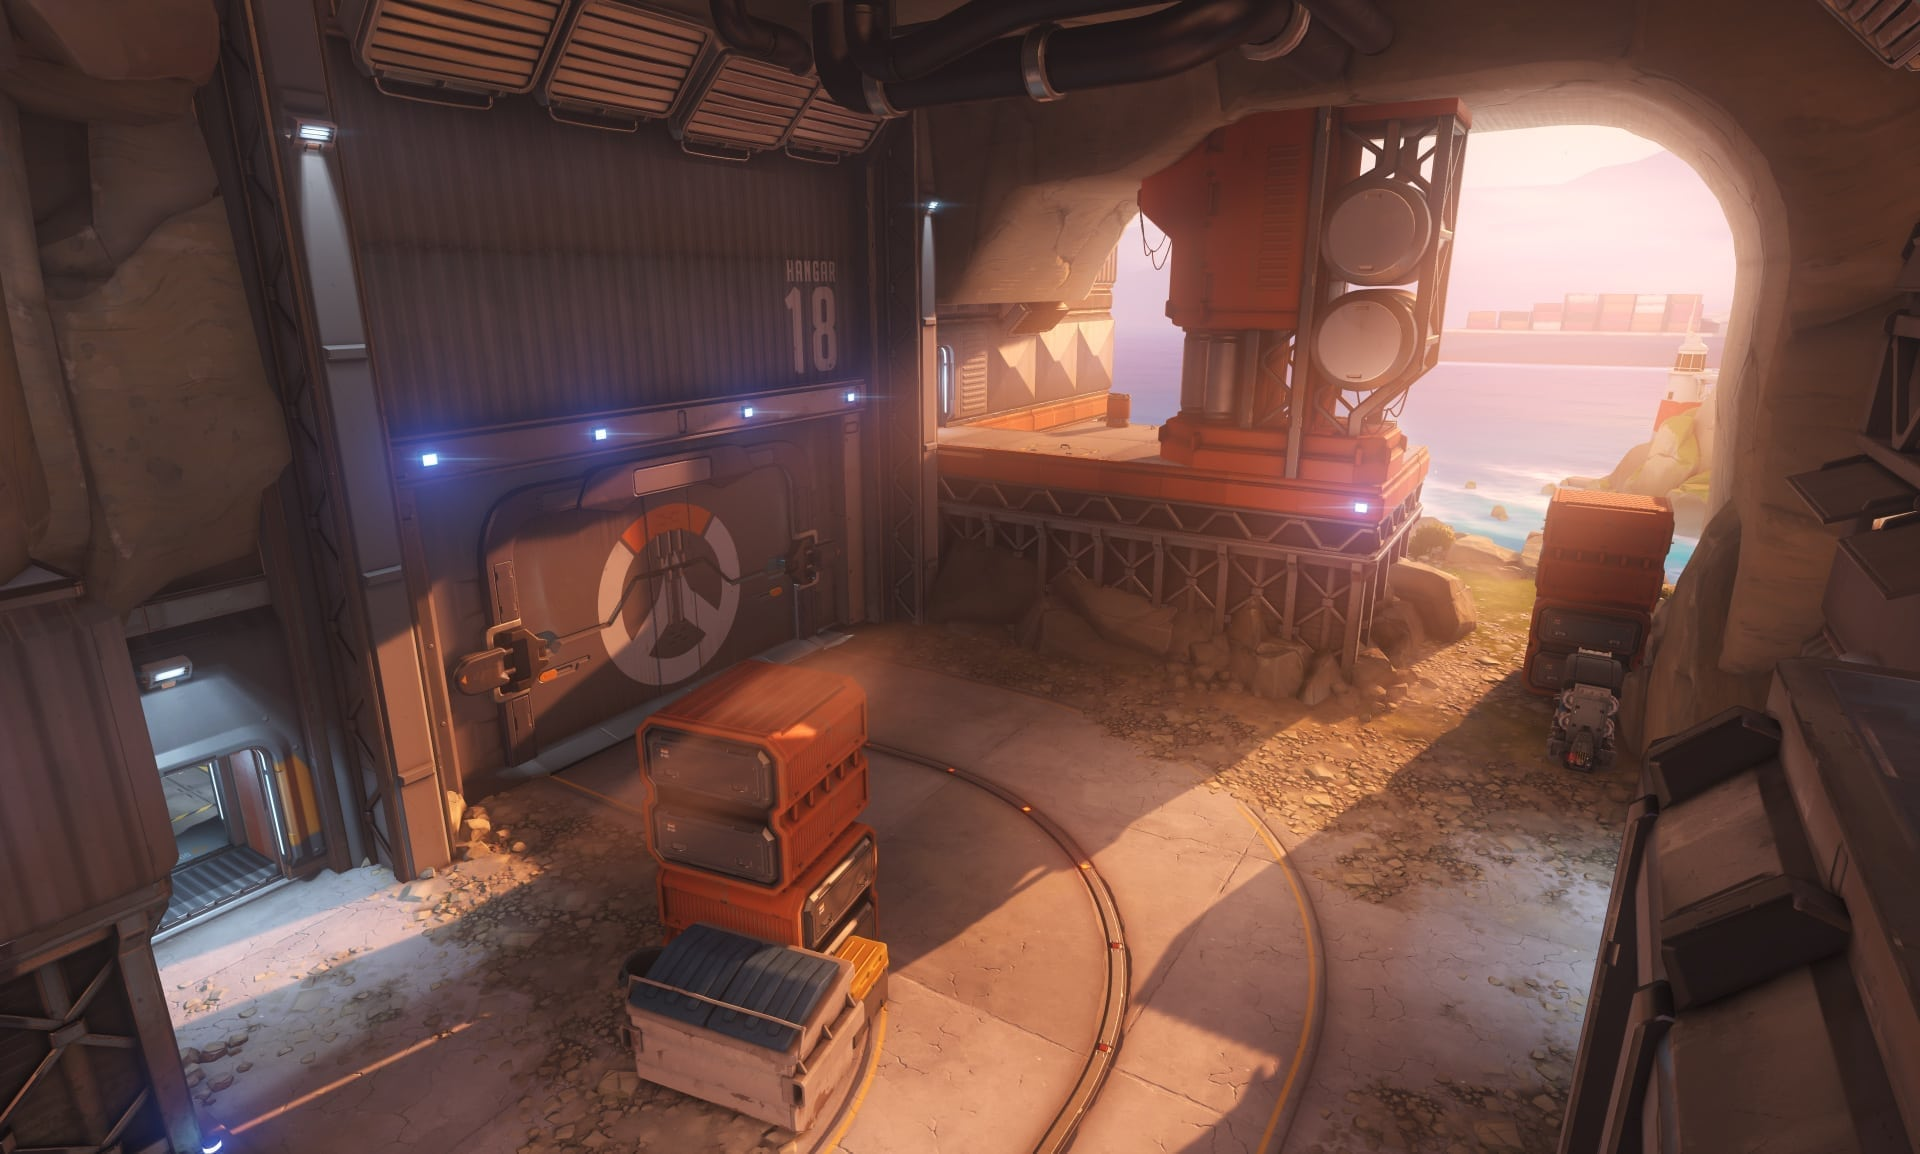 Overwatch - Watchpoint Gibraltar screenshot 1